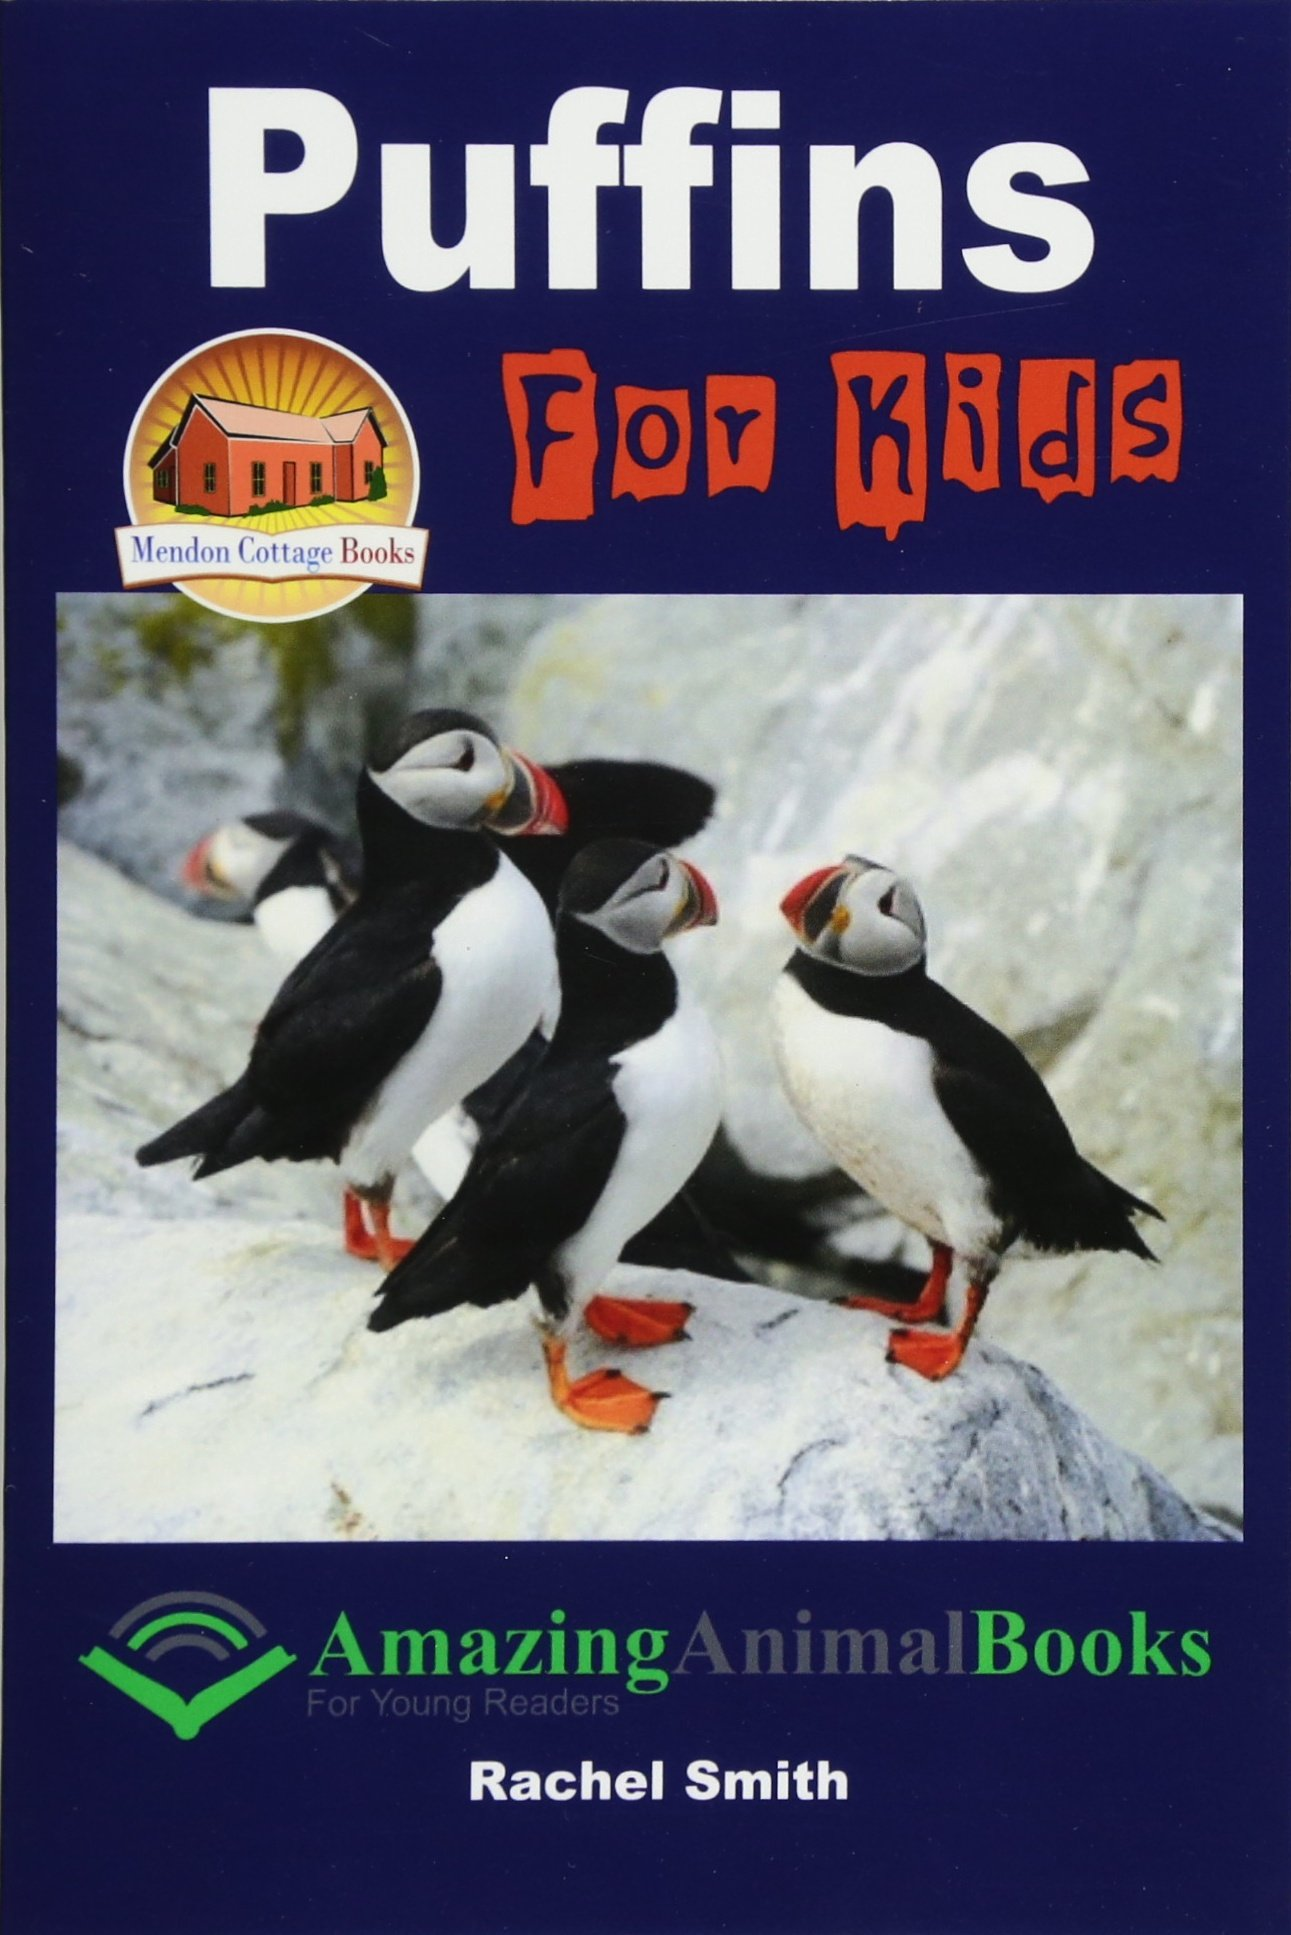 Puffins For Kids Rachel Smith John Davidson Mendon Cottage Books 9781516852543 Amazon